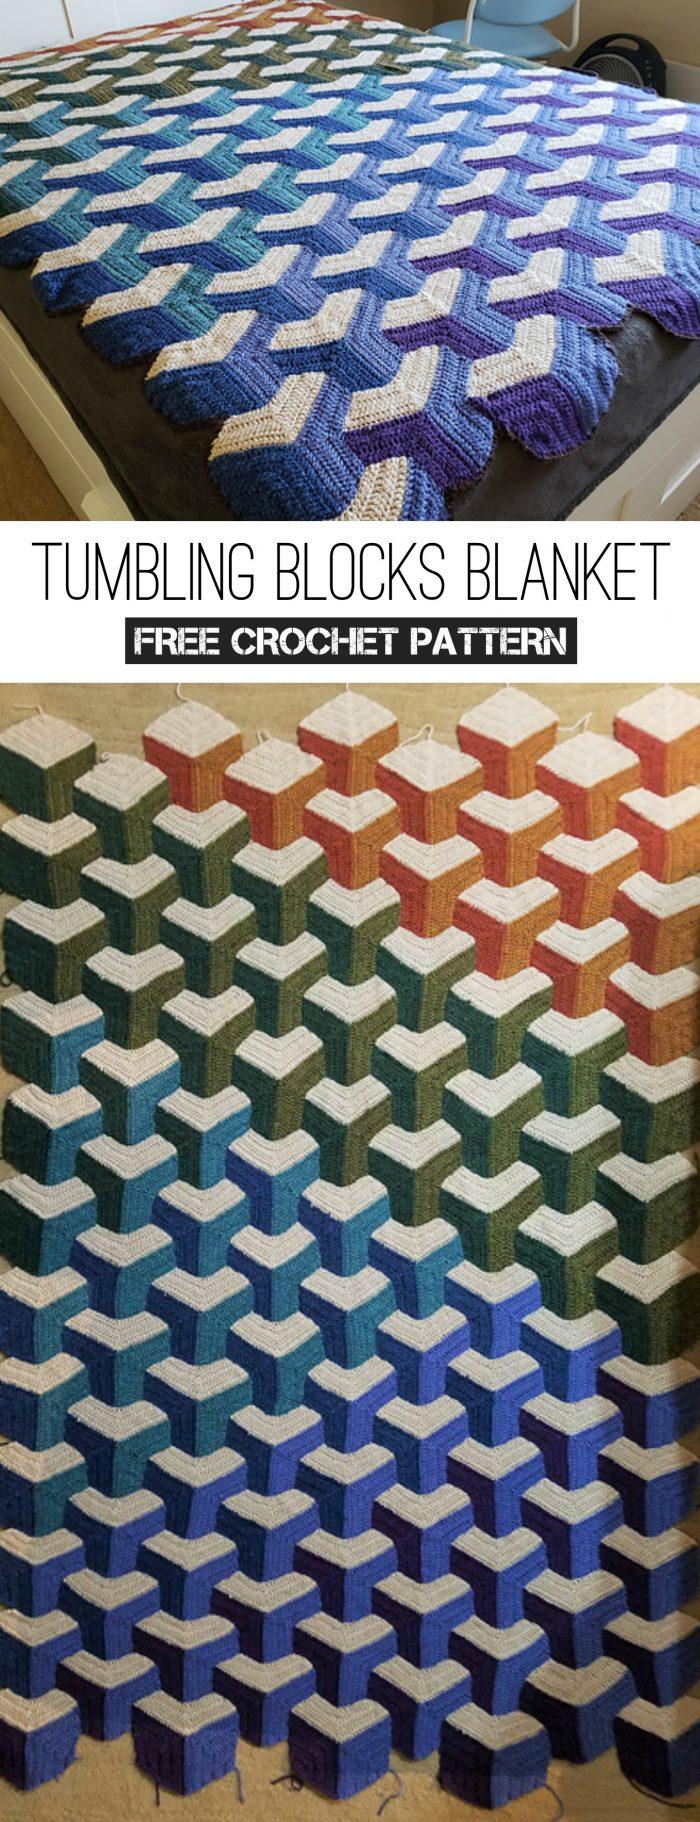 Tumbling Blocks Blanket Free Crochet Pattern